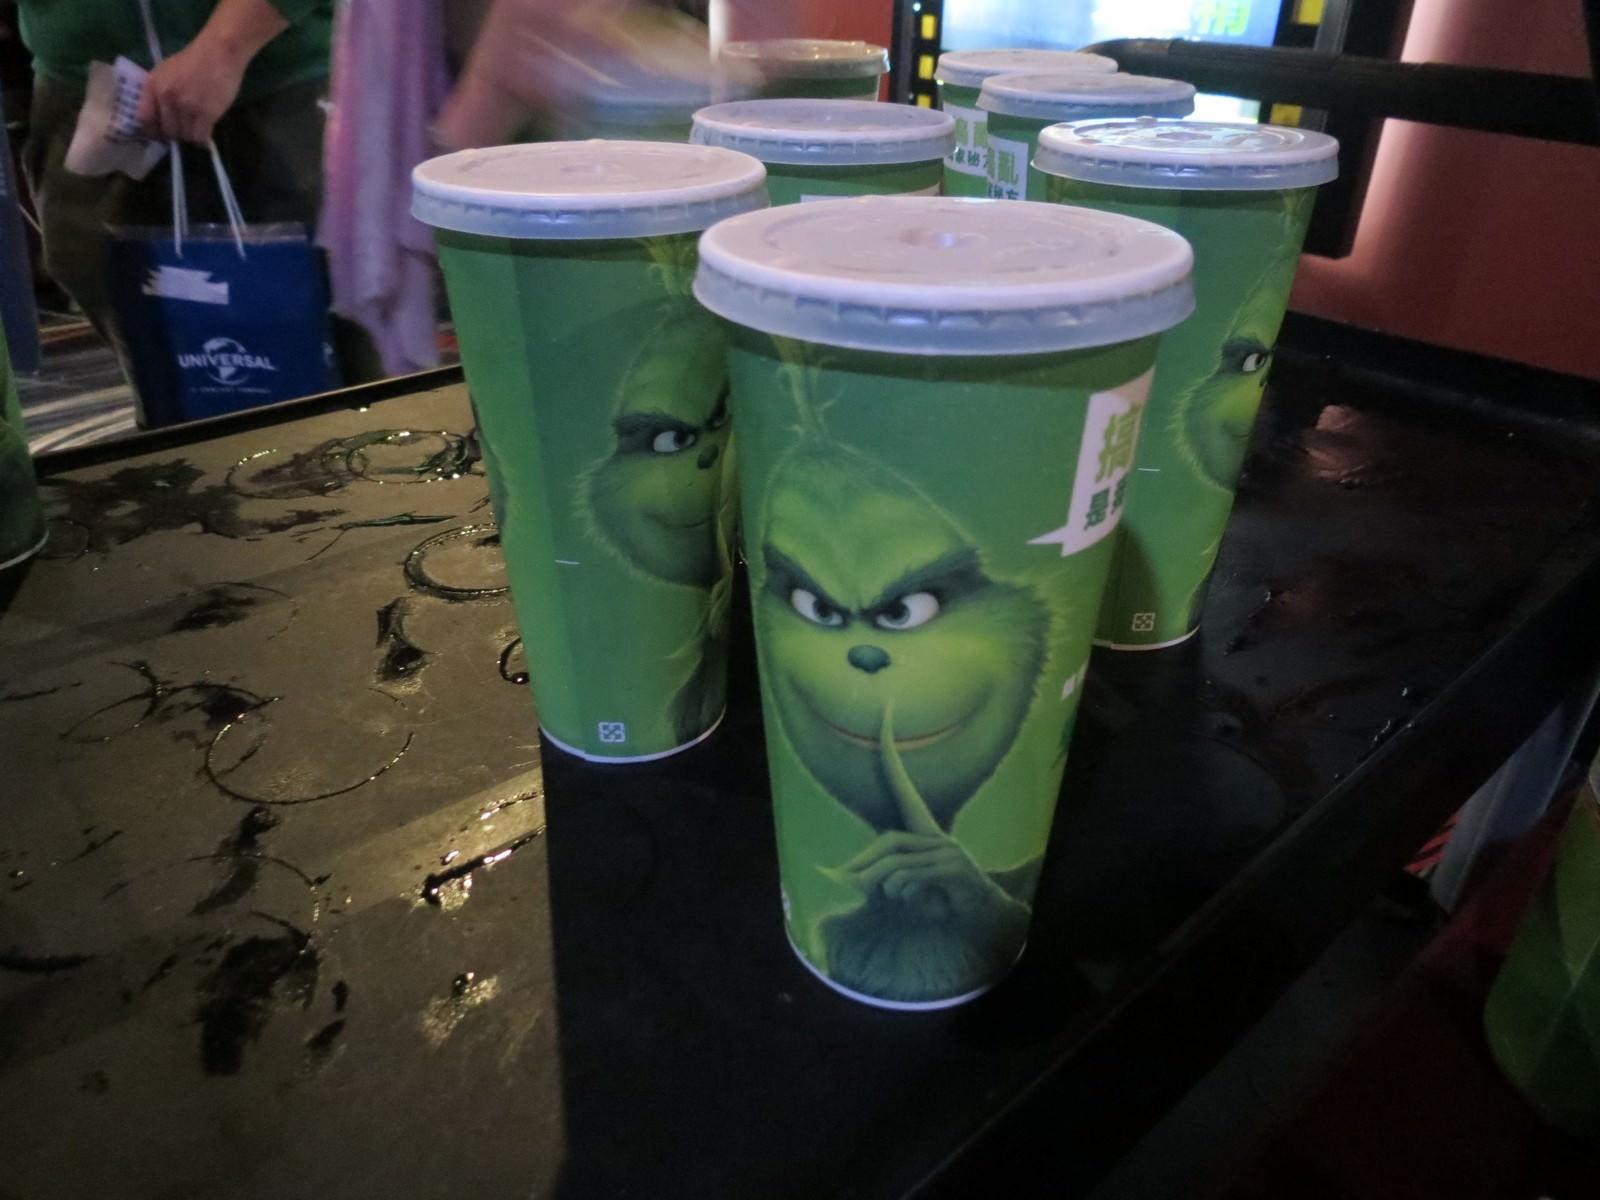 Movie, The Grinch(美國, 2018年) / 鬼靈精(台灣) / 绿毛怪格林奇(中國) / 聖誕怪怪傑(香港), 特映會現場, 飲料